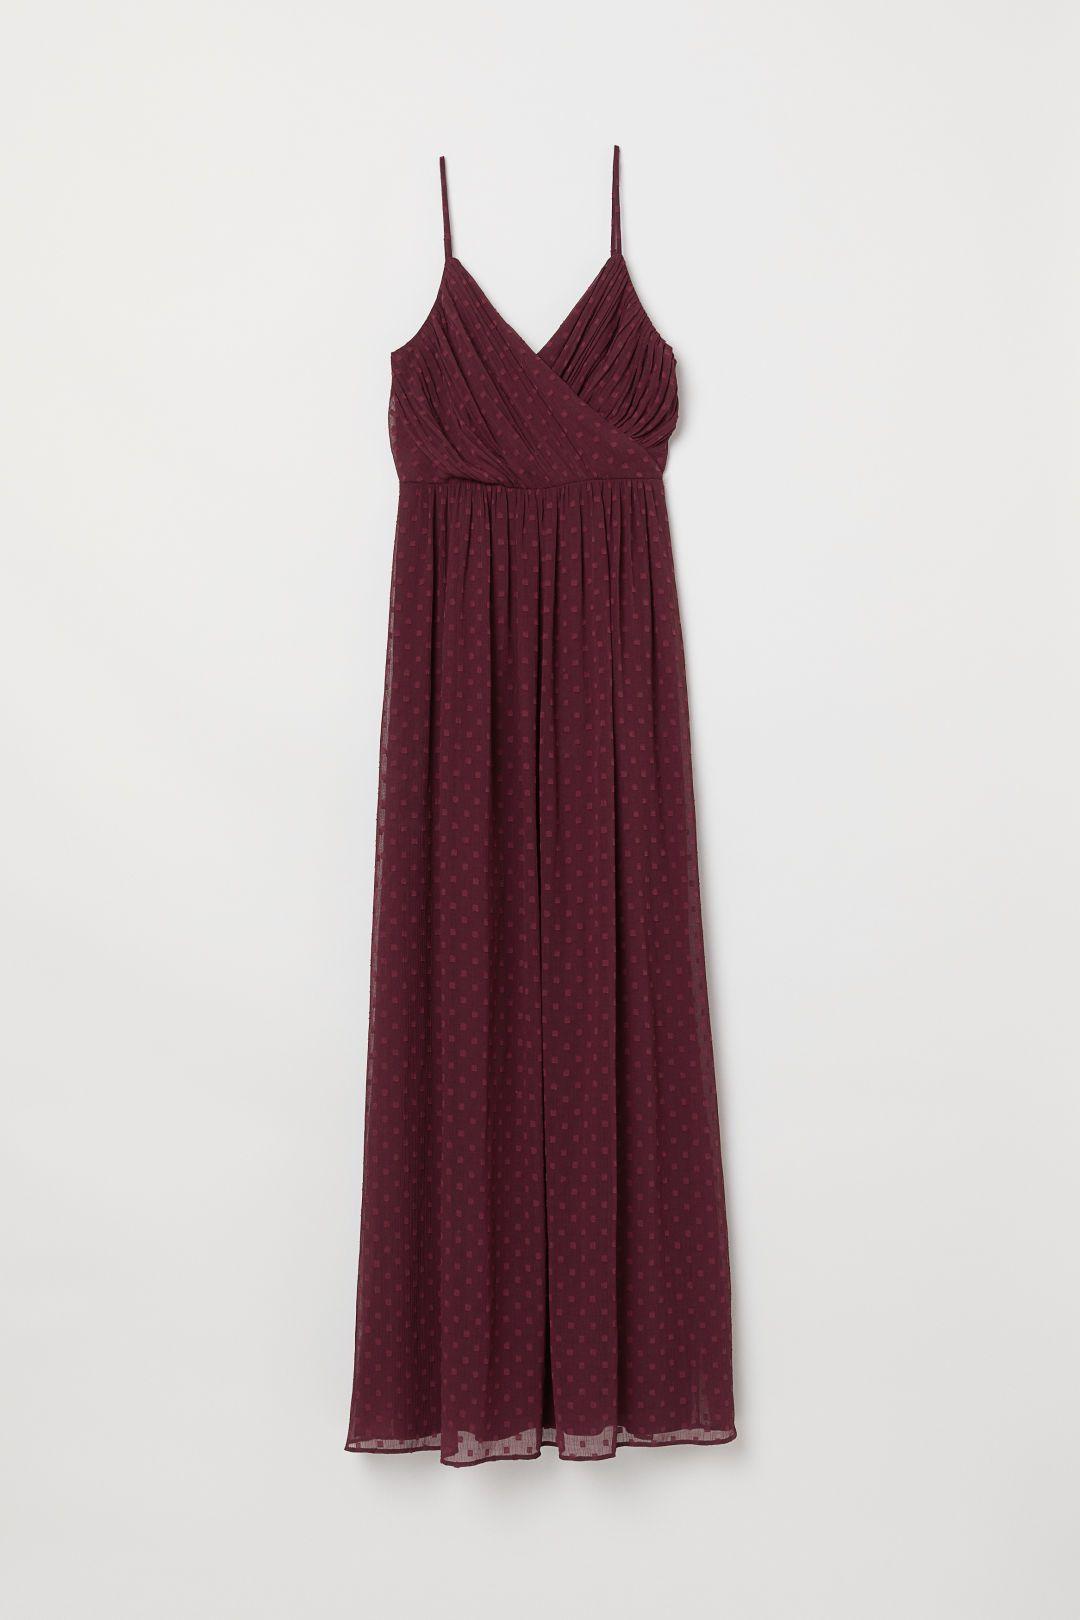 Long dress fall winter fine art styling pinterest dresses